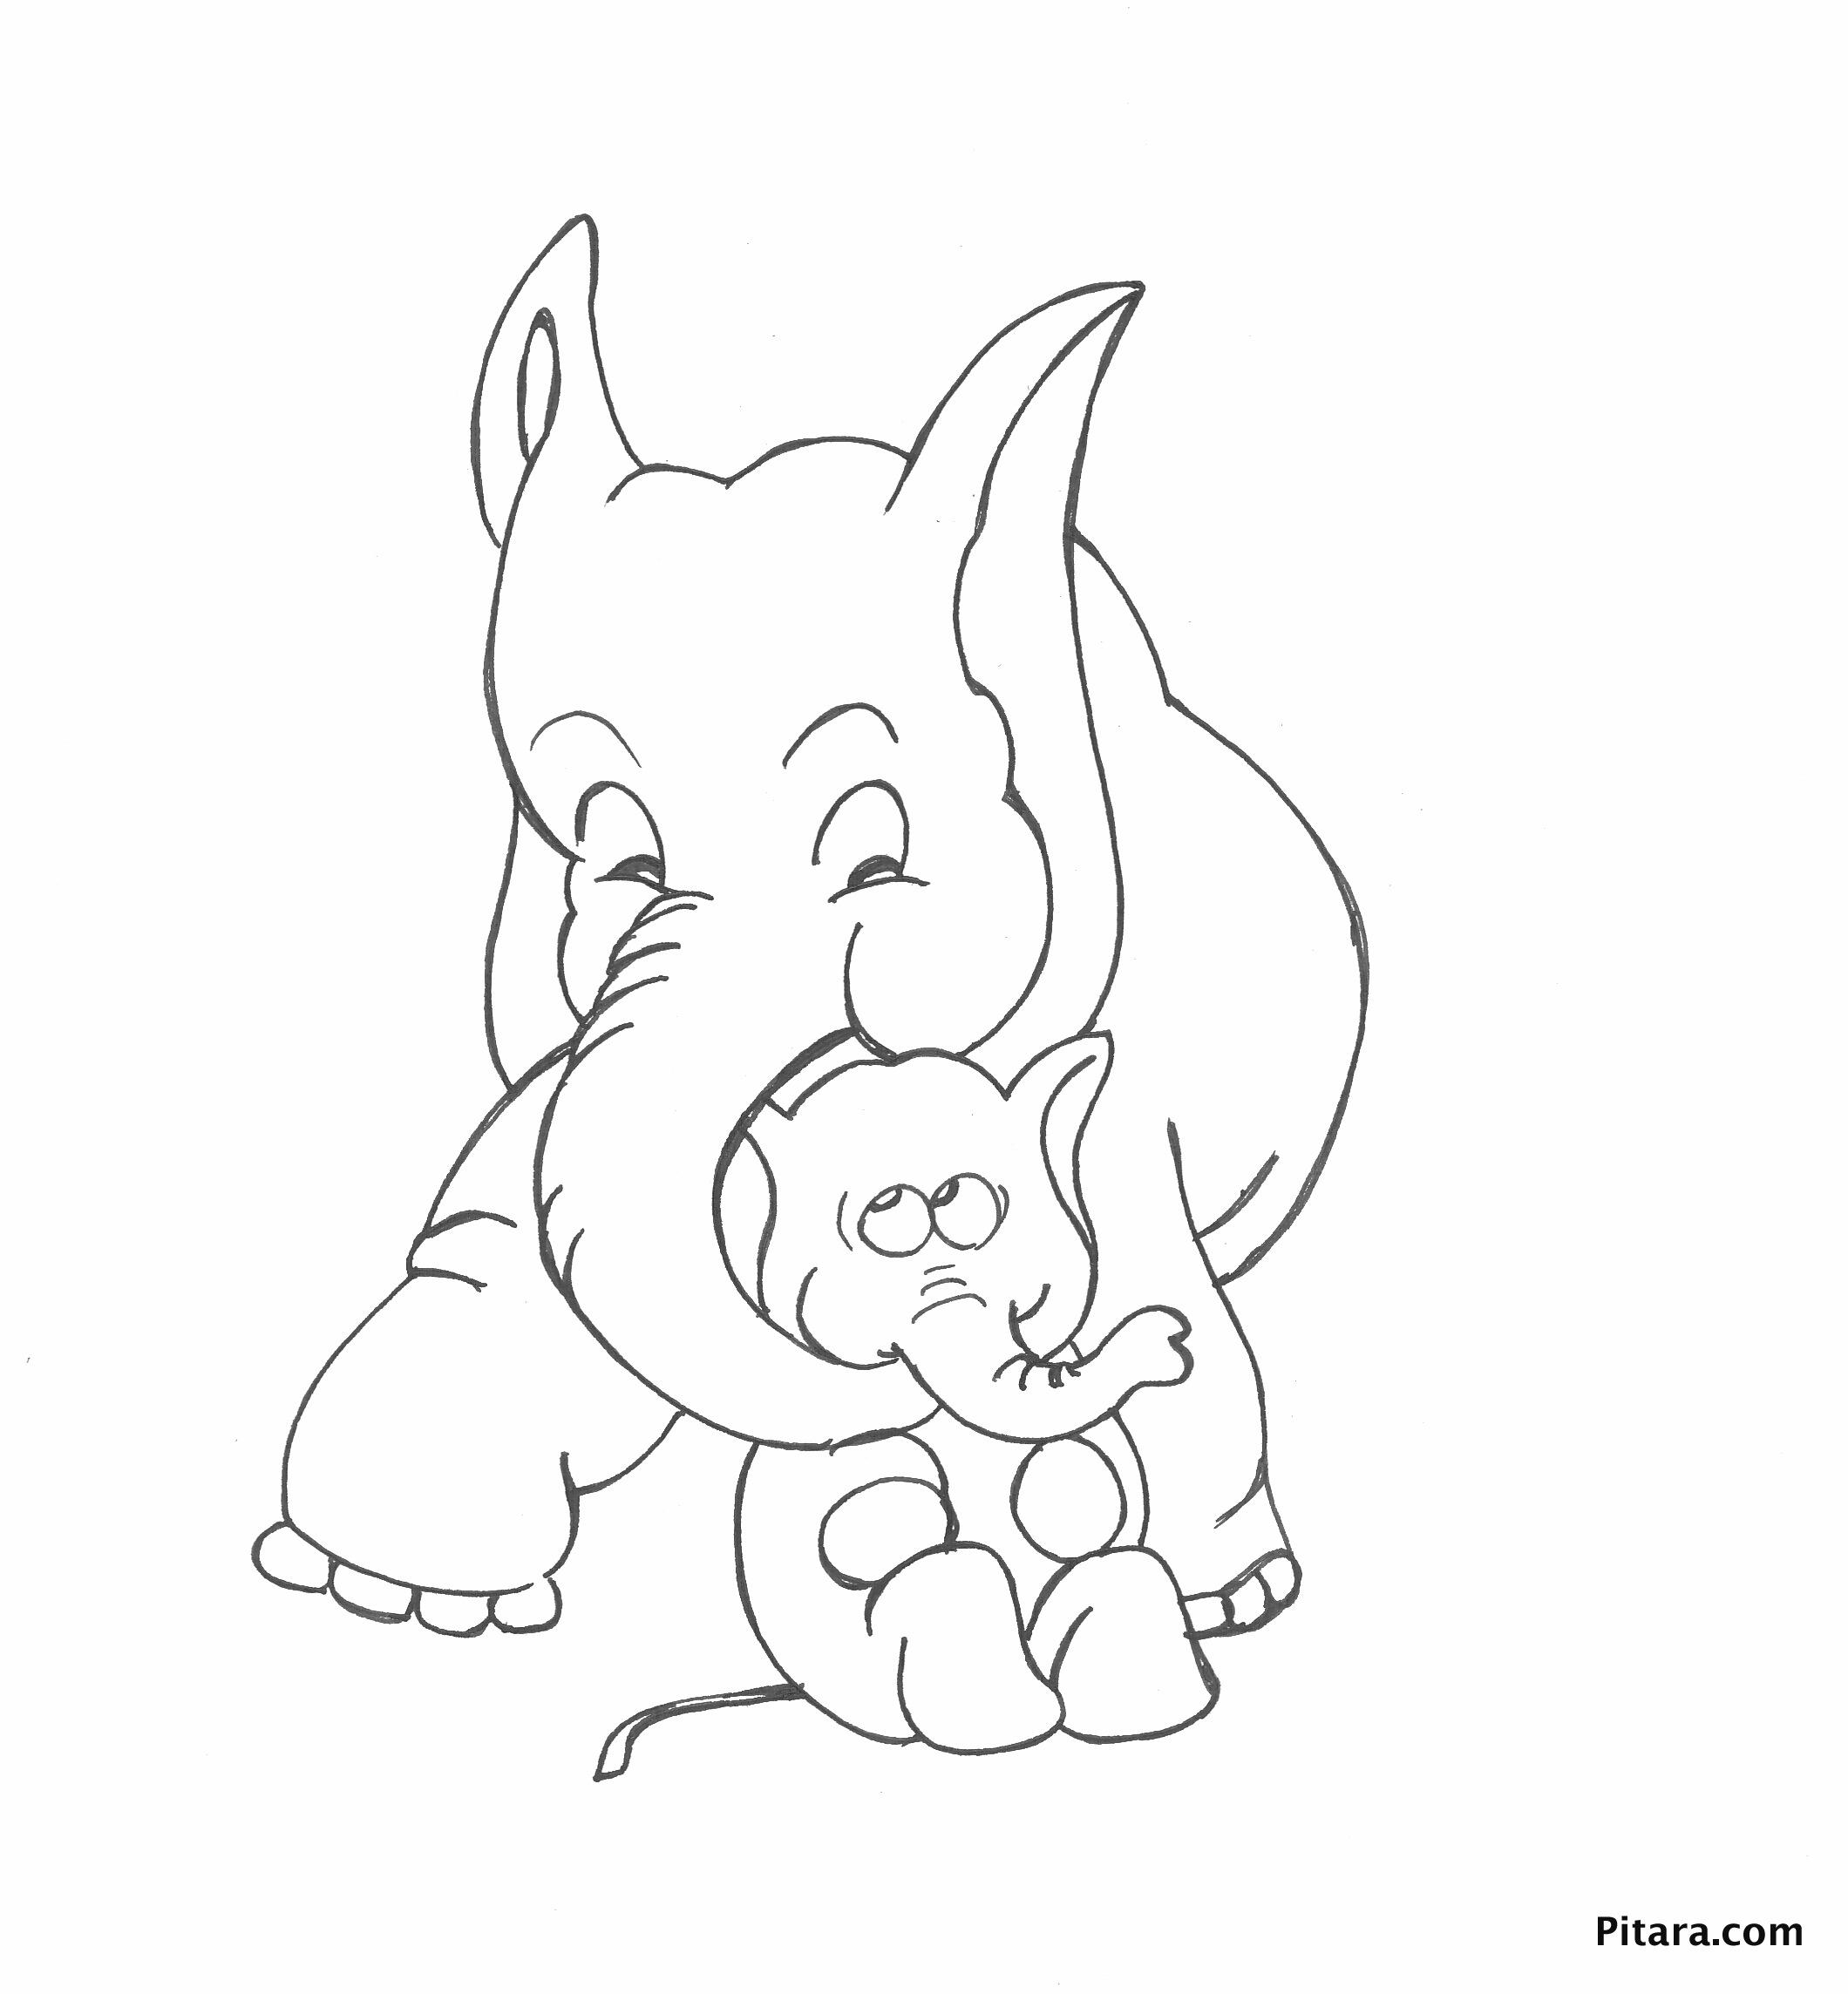 Elephant - Mother & baby